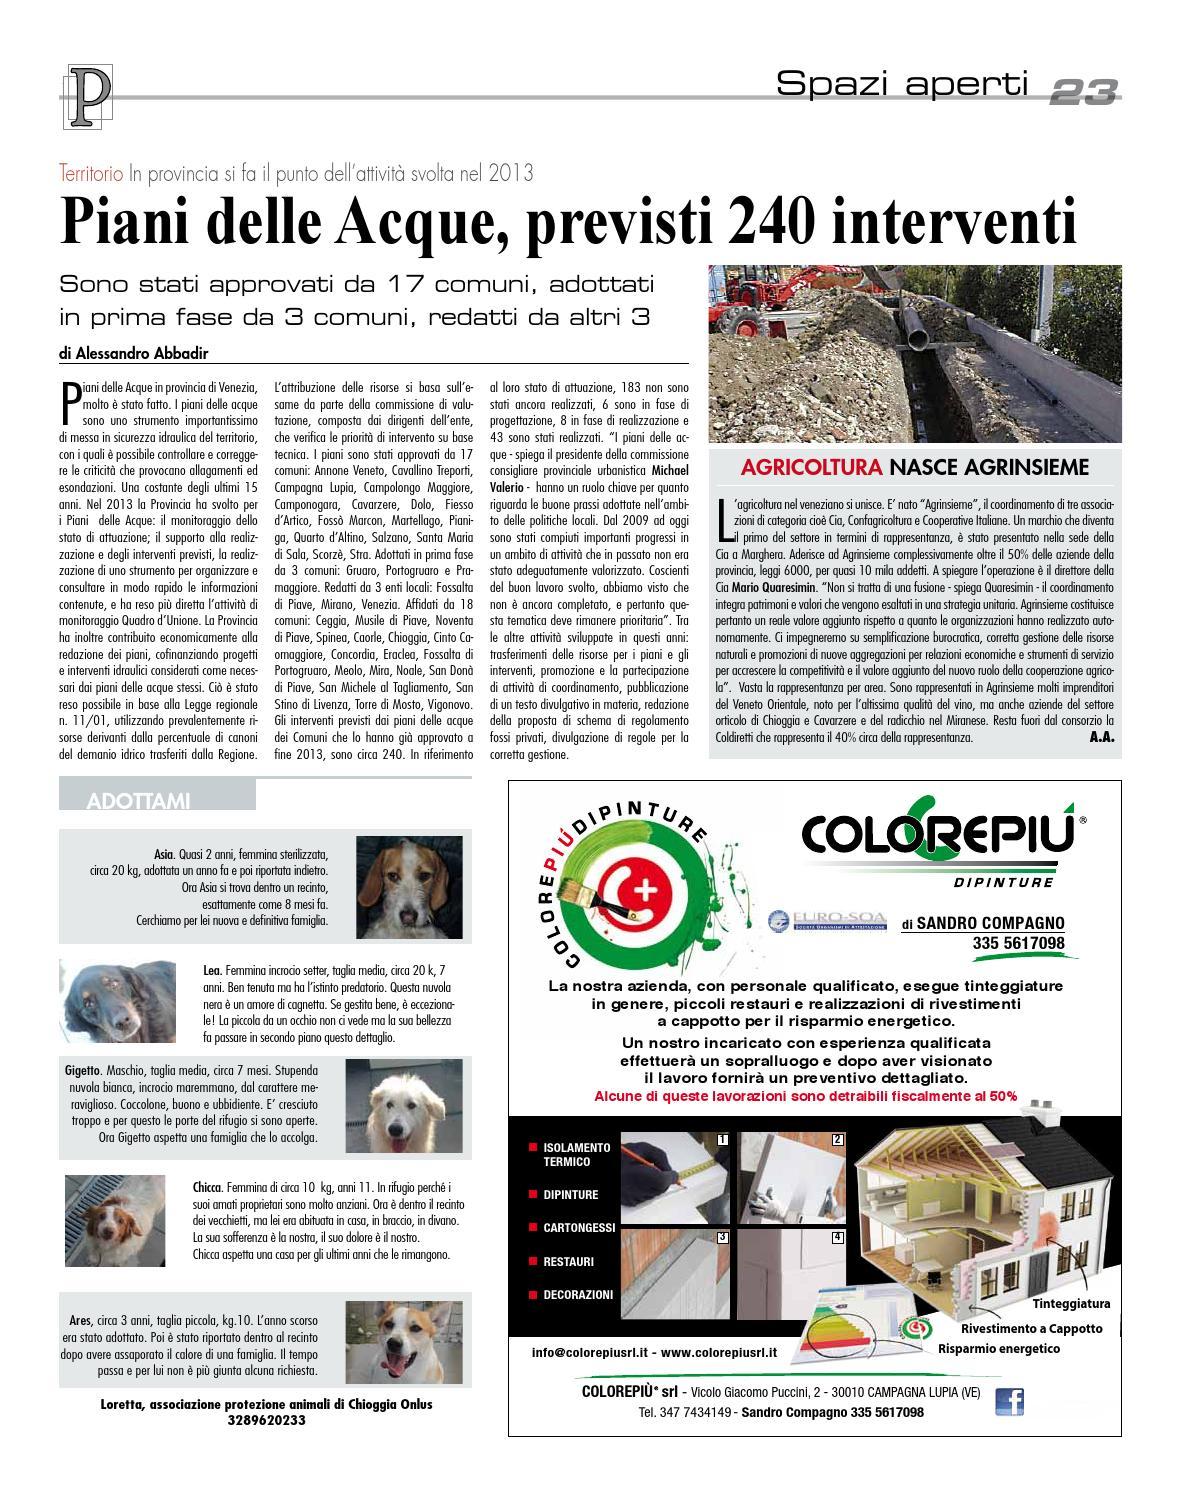 Miranese sud febb2014 n18 by LaPiazza give emotions issuu